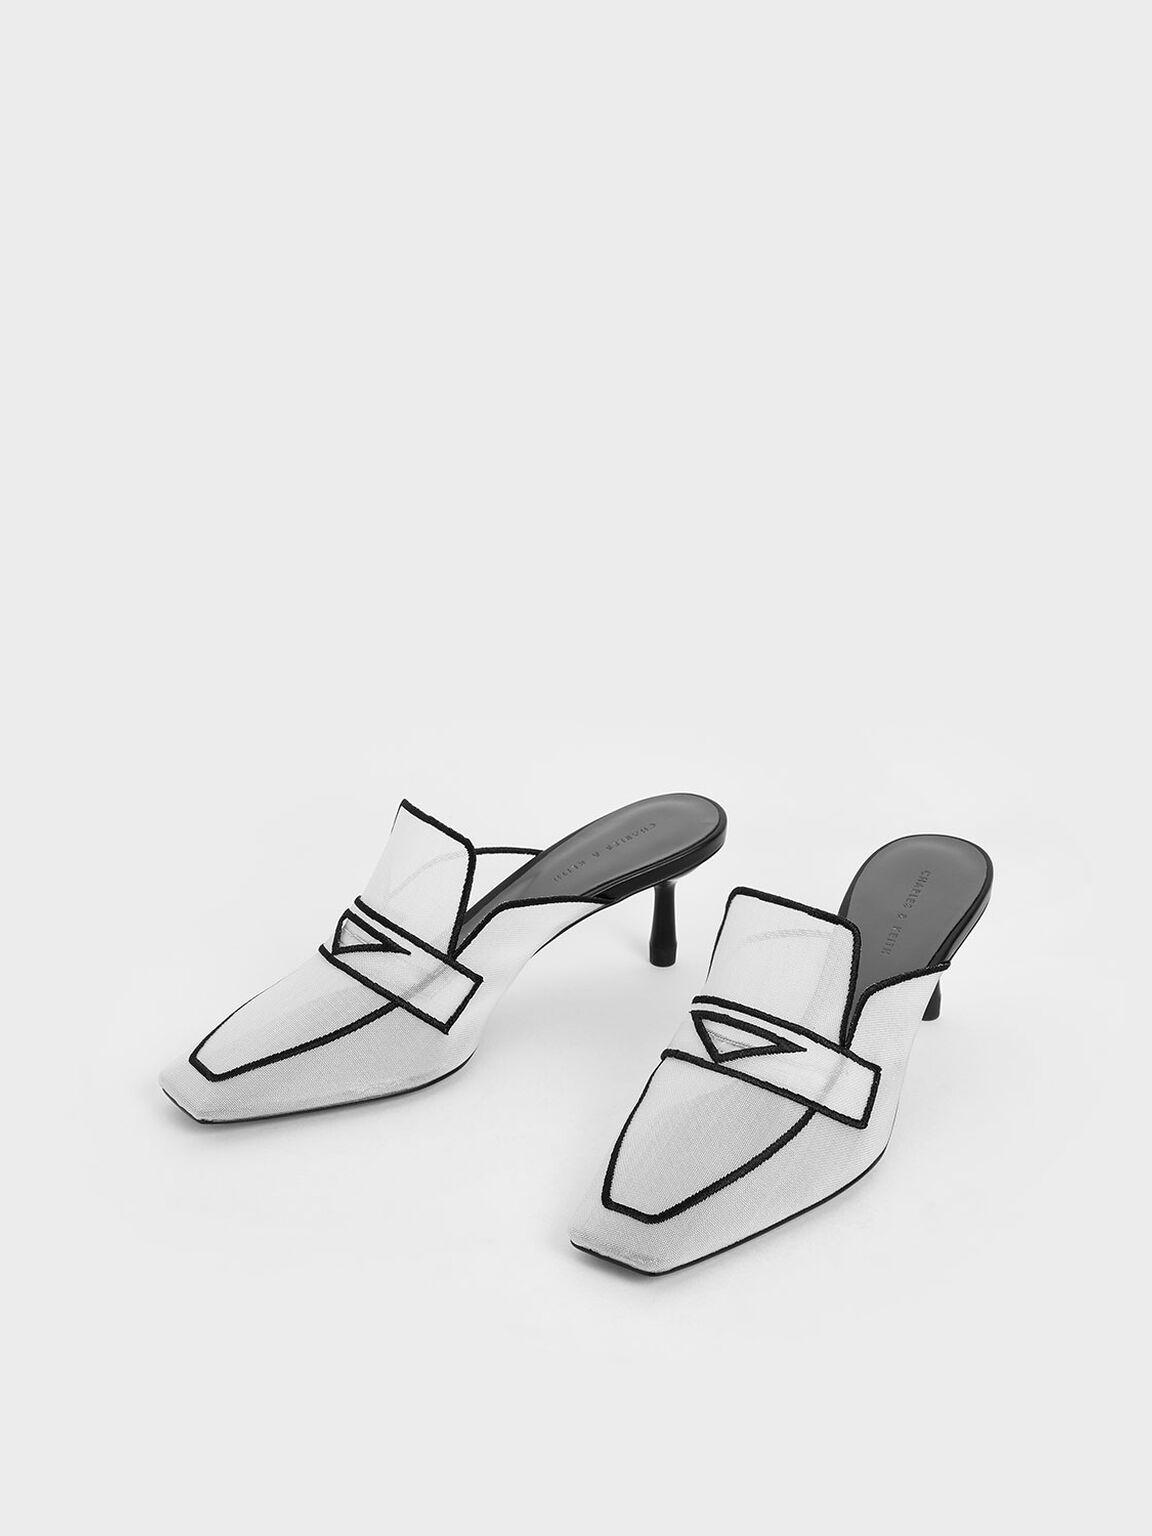 Mesh Loafer Mules, White, hi-res